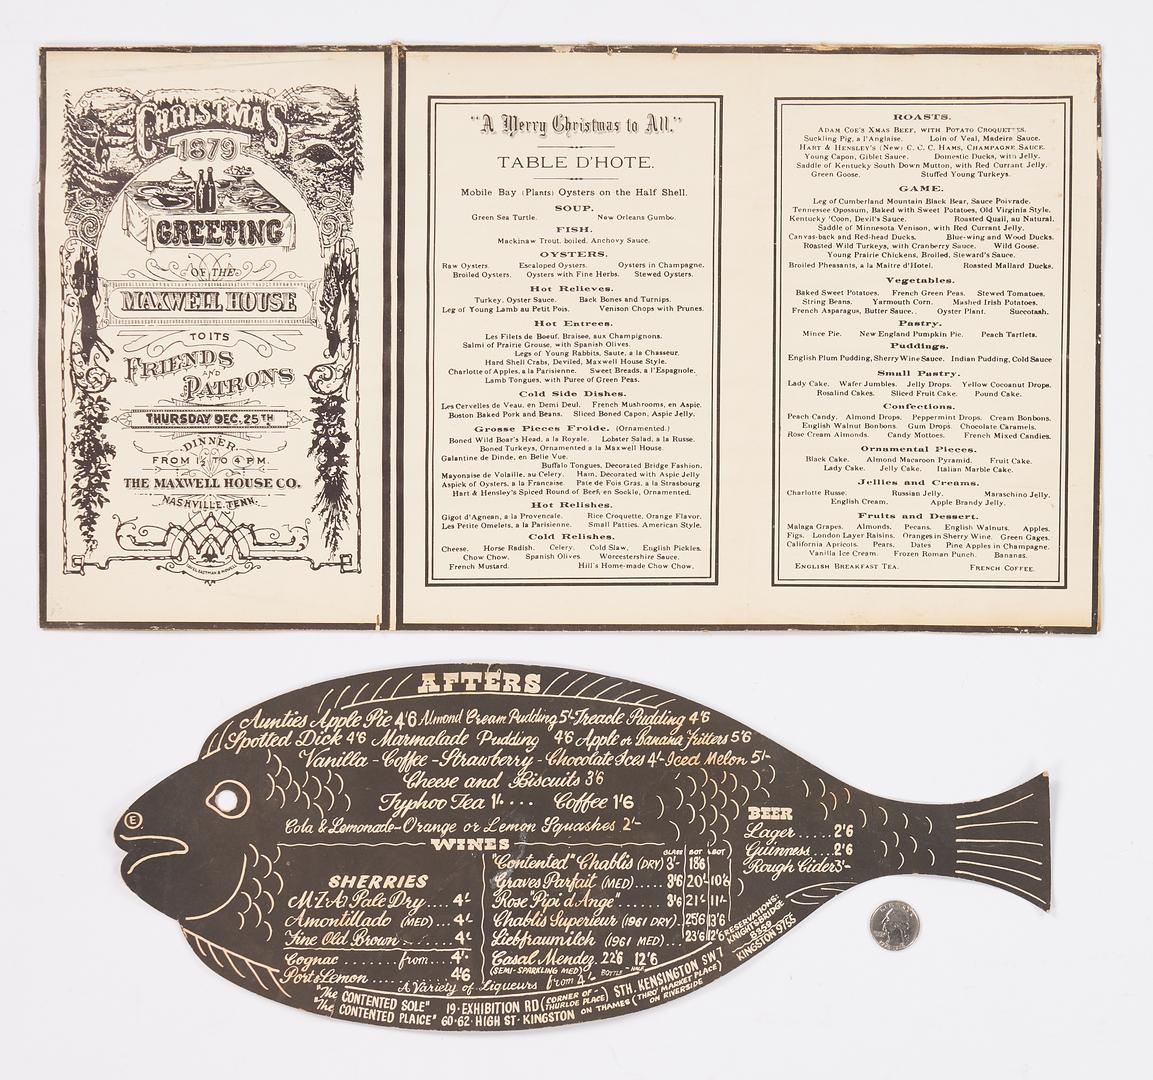 Lot 849: Nashville Maxwell House Hotel Menu + English Fish Menu, 3 items